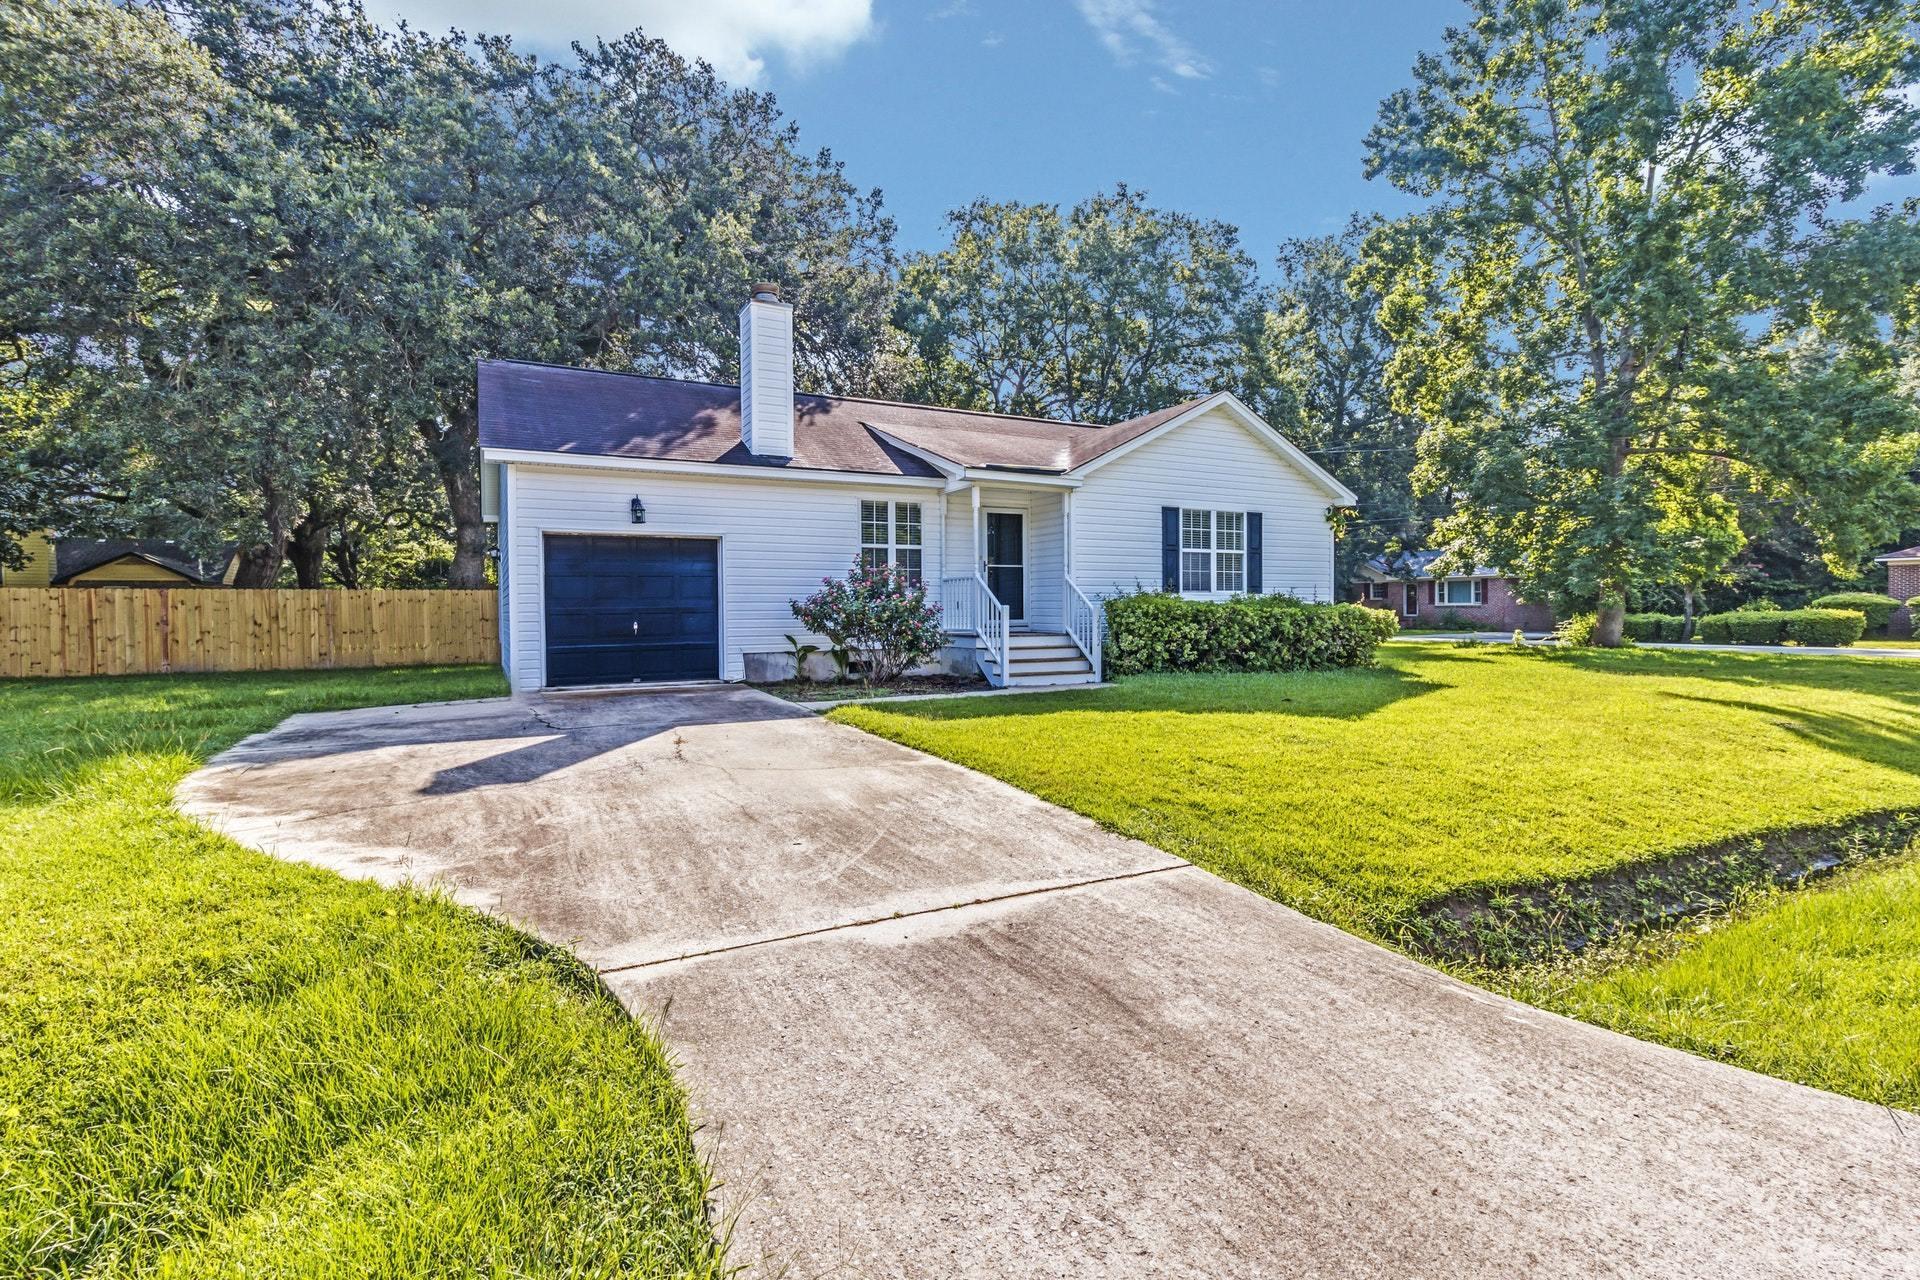 Double Oaks Homes For Sale - 2402 Double Oak, Charleston, SC - 0